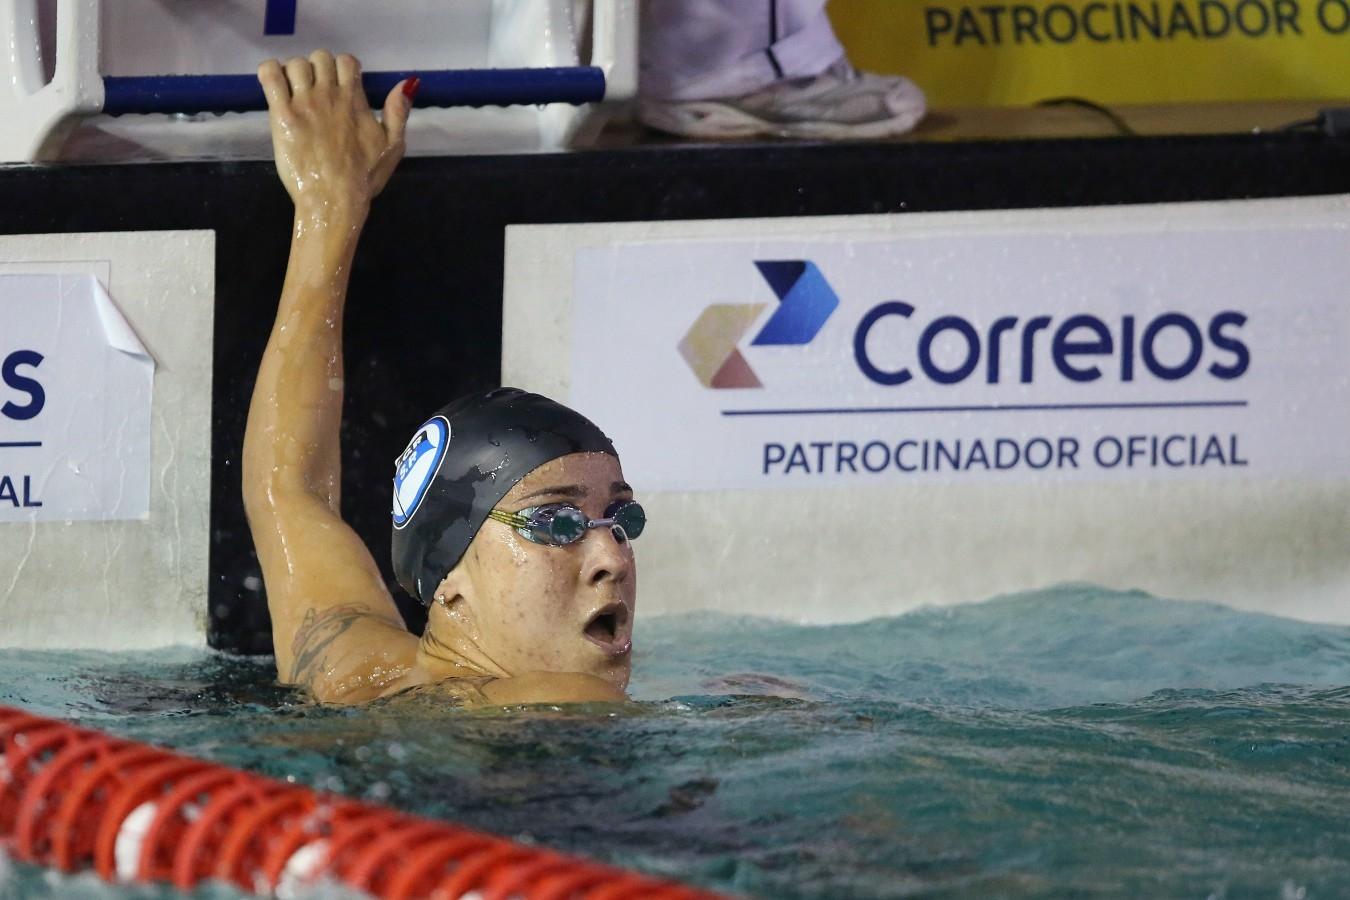 Joanna Maranhao - Trofeu Jose Finkel de Natacao no Clube Internacional de Regatas. 15 de Setembro de 2016, Santos, SP, Brasil. Foto:Satiro Sodré/SSPress.